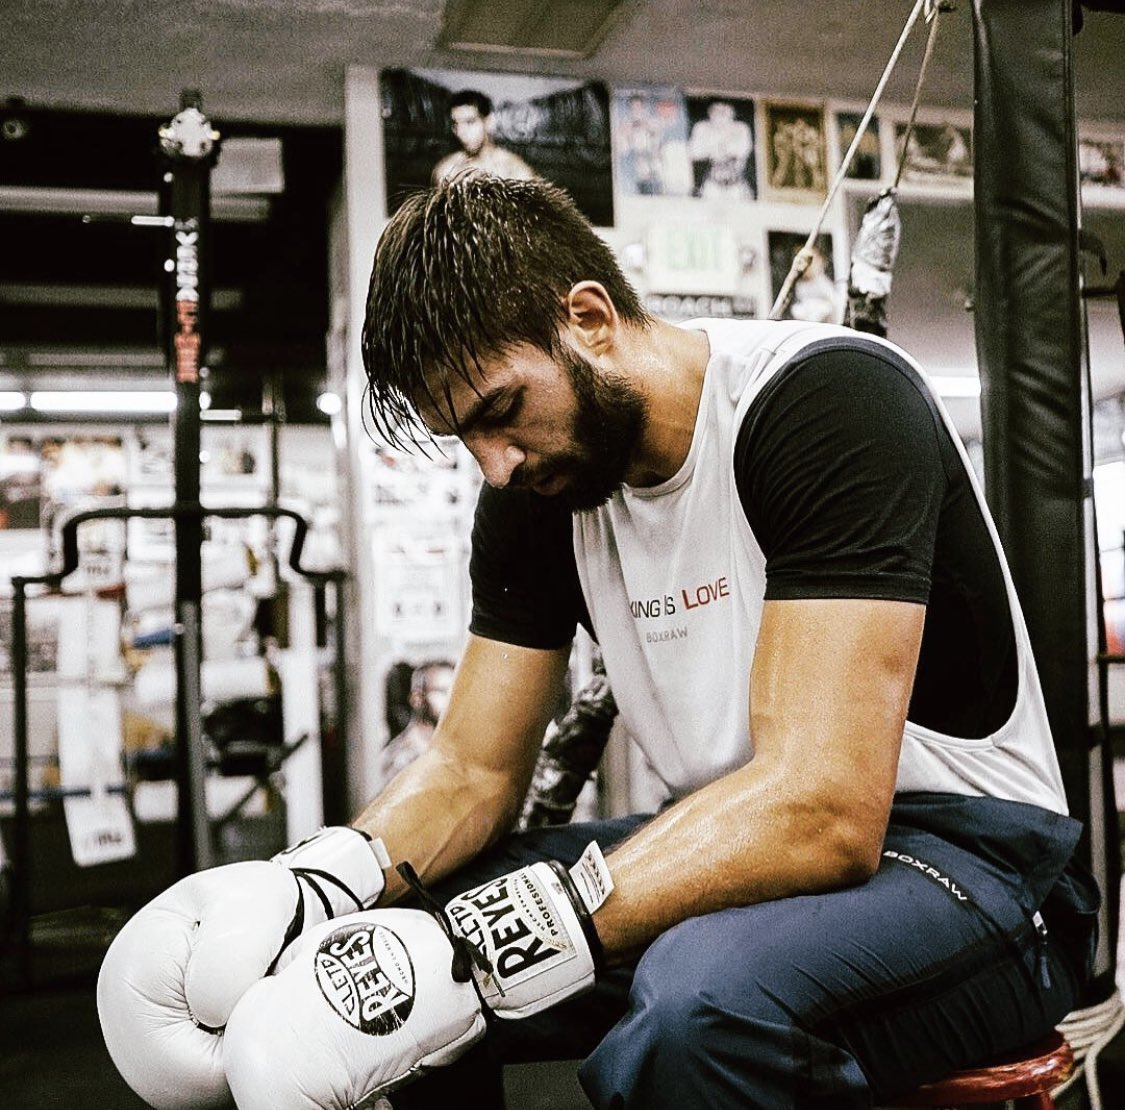 Tuesday grind @marcodeckmann #wildcardboxing #keeppunching #ItAintEasy #boxer #fighter #training #trainers #boxing #family #fightgame #boxinglife #gymlife @FreddieRoach @PepeReillyBox @iamSPEEDYG @WCBstore @scottquigg @TomLoeffler1 @360BoxingPromos @Bash_Boxing 📸 @RodneyPinz